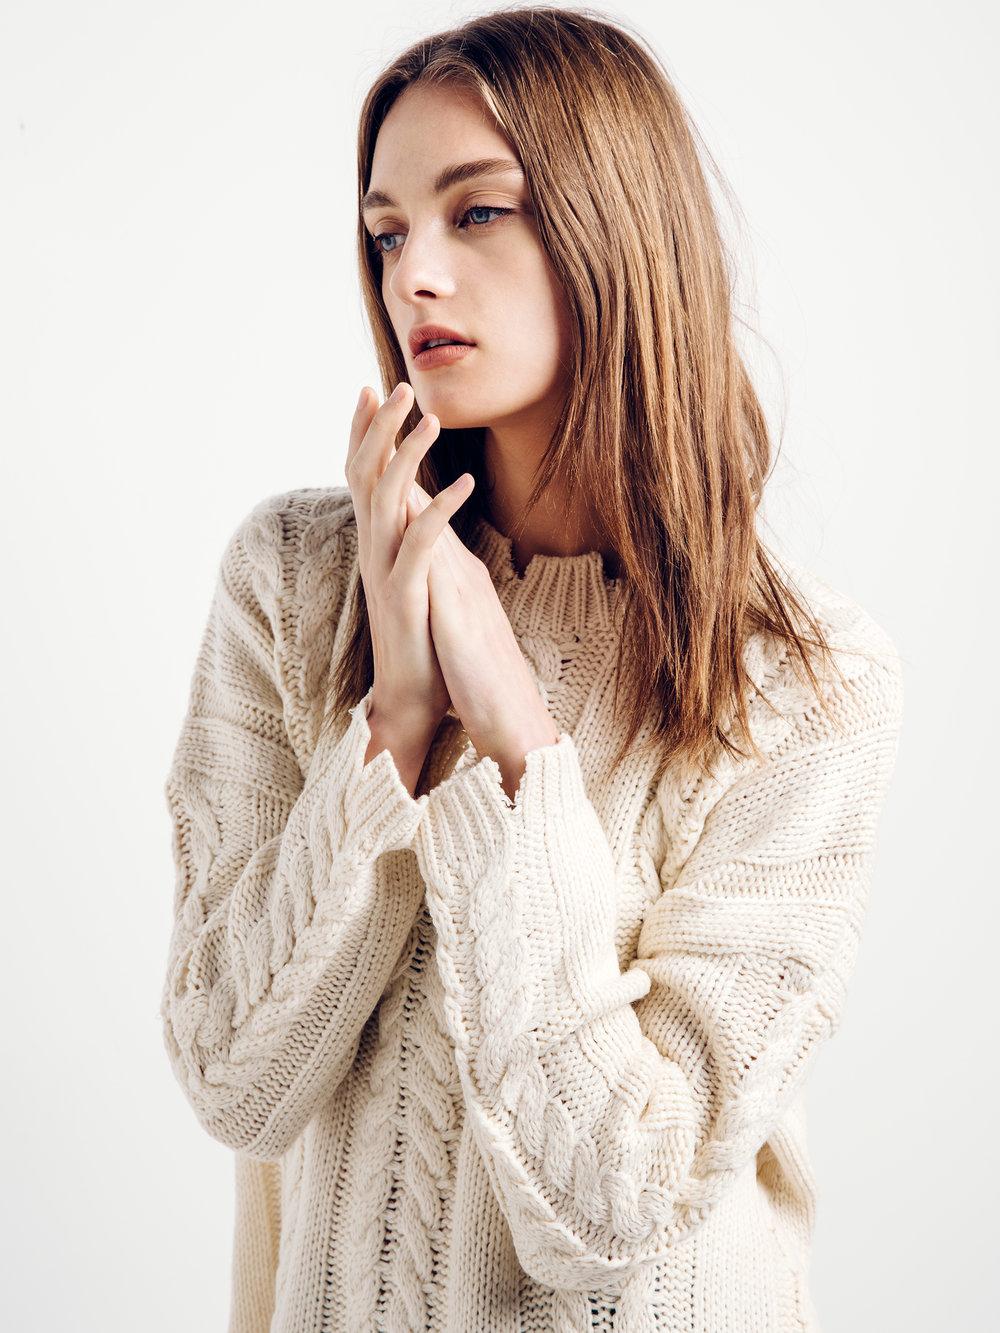 julia_belyakova_portrait1.jpg